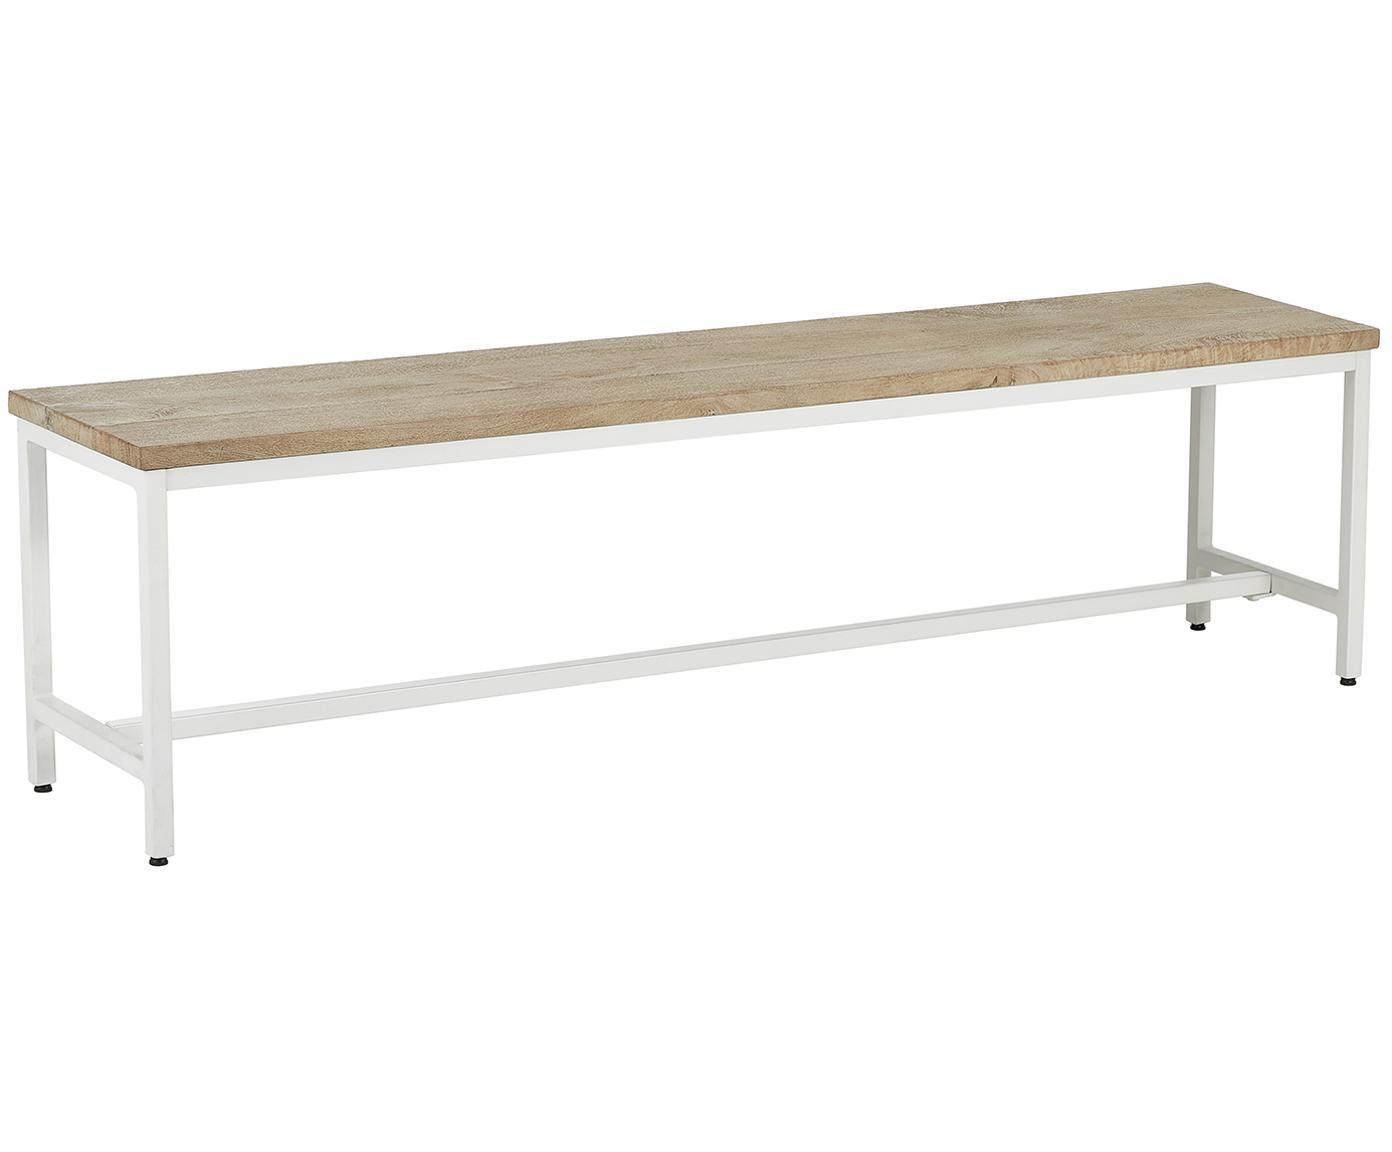 Banco de madera maciza Raw, Asiento: madera de mango maciza, c, Estructura: metal con pintura en polv, Asiento: madera de mango, Estructura: blanco mate, An 170 x Al 47 cm